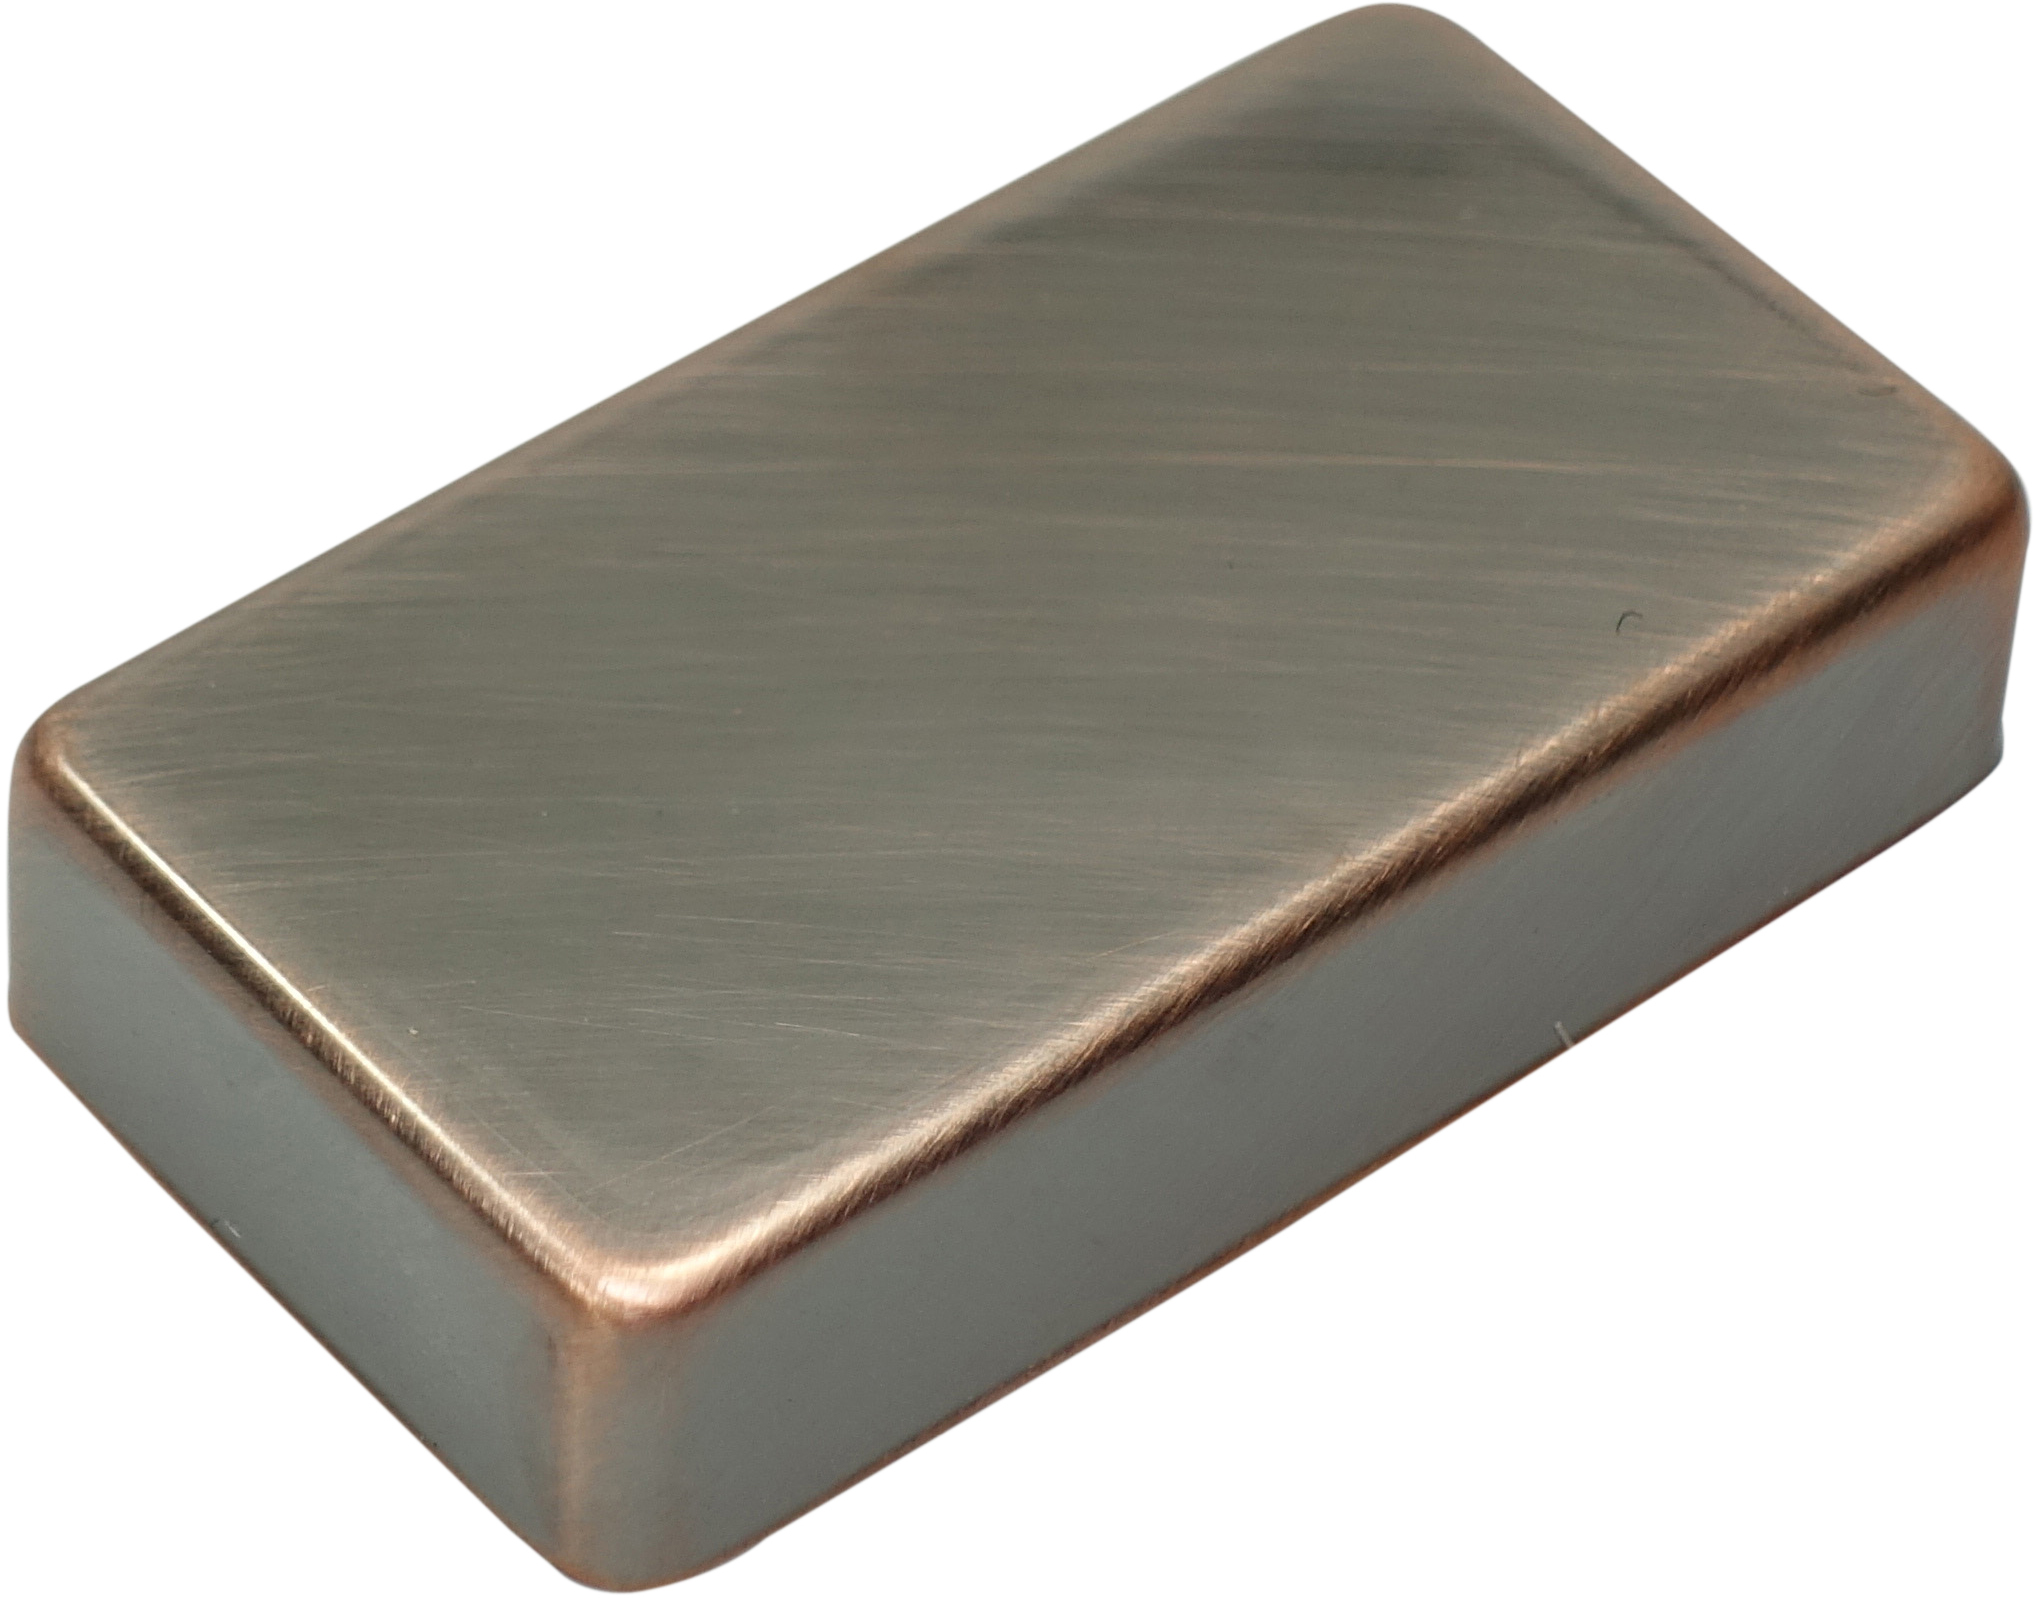 Schaller cover Closed Vintage Copper